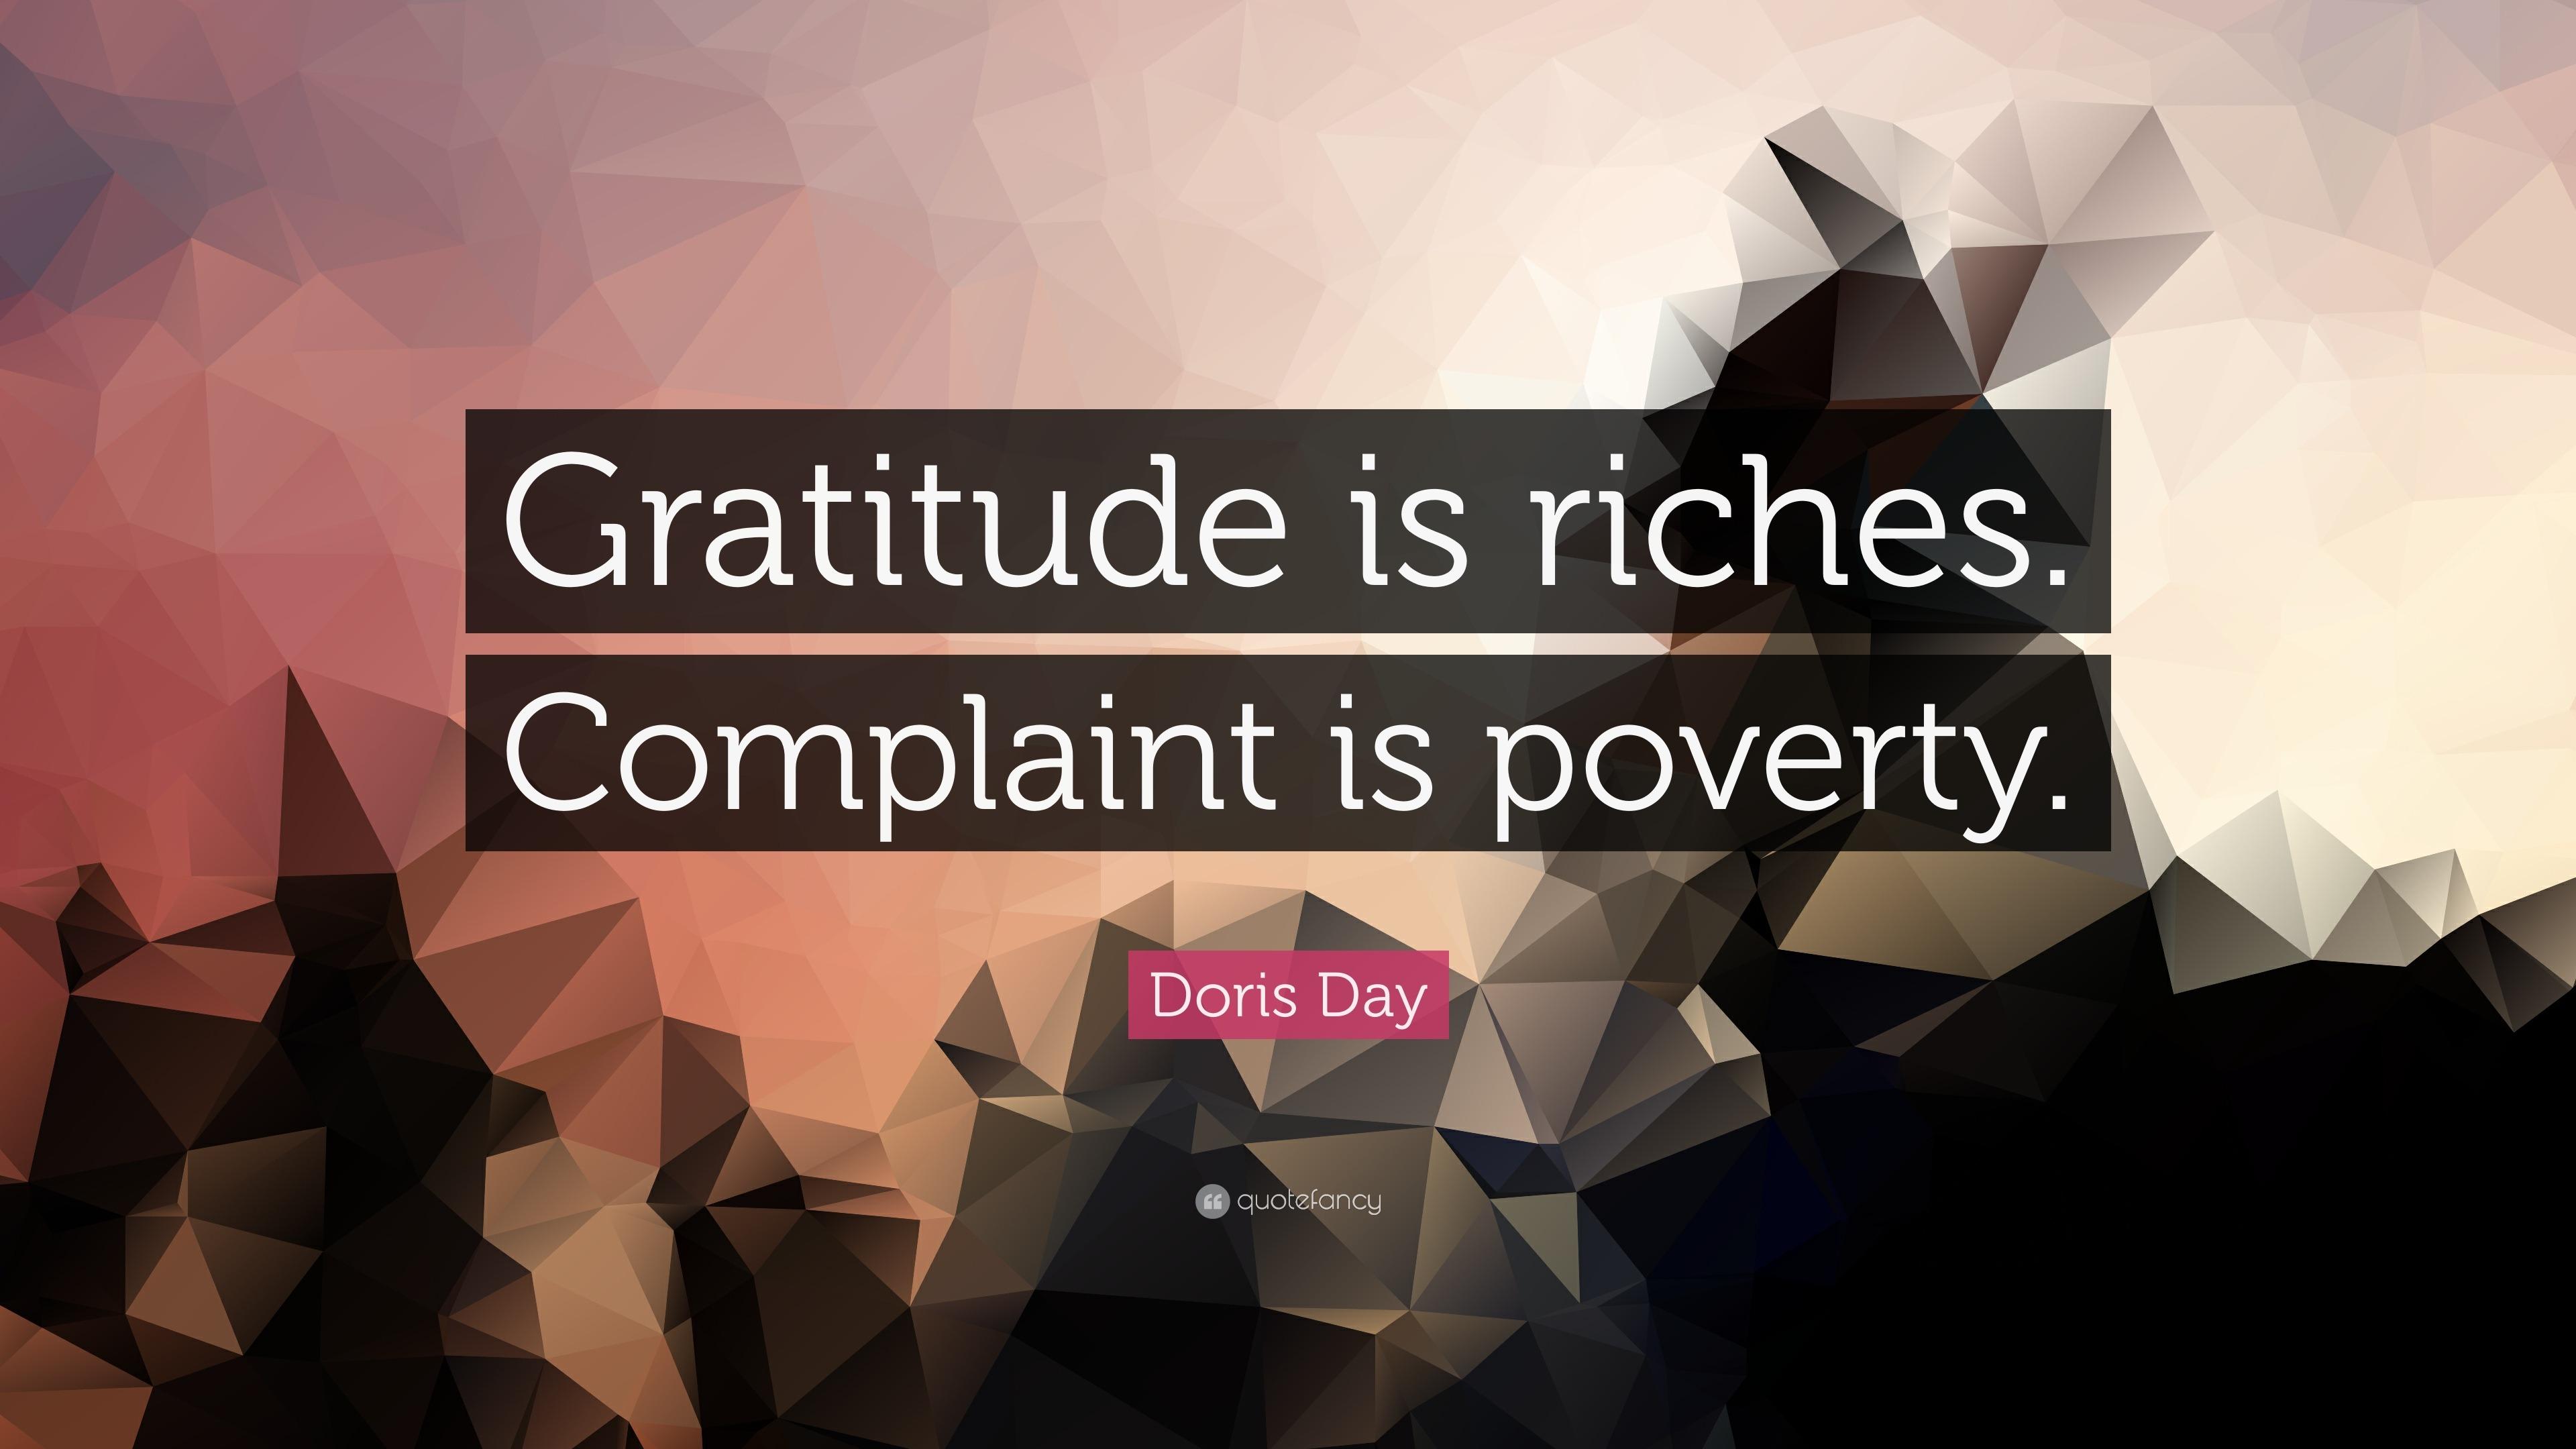 Gratitude Quotes: U201cGratitude Is Riches. Complaint Is Poverty.u201d U2014 Doris Day